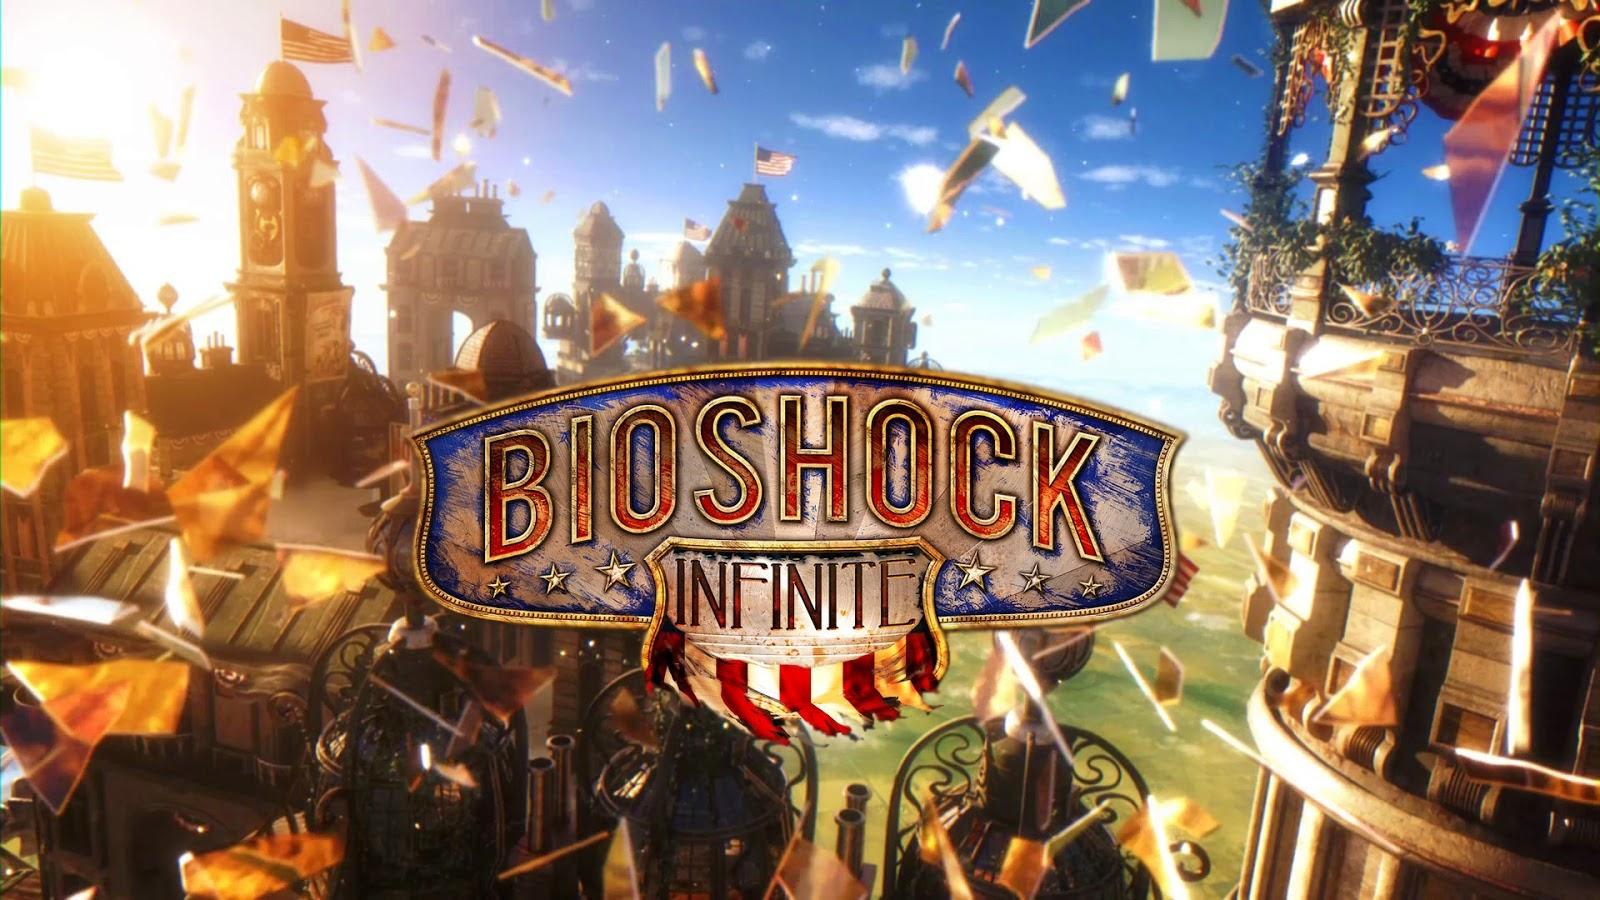 Bioshock Infinite should reach Linux